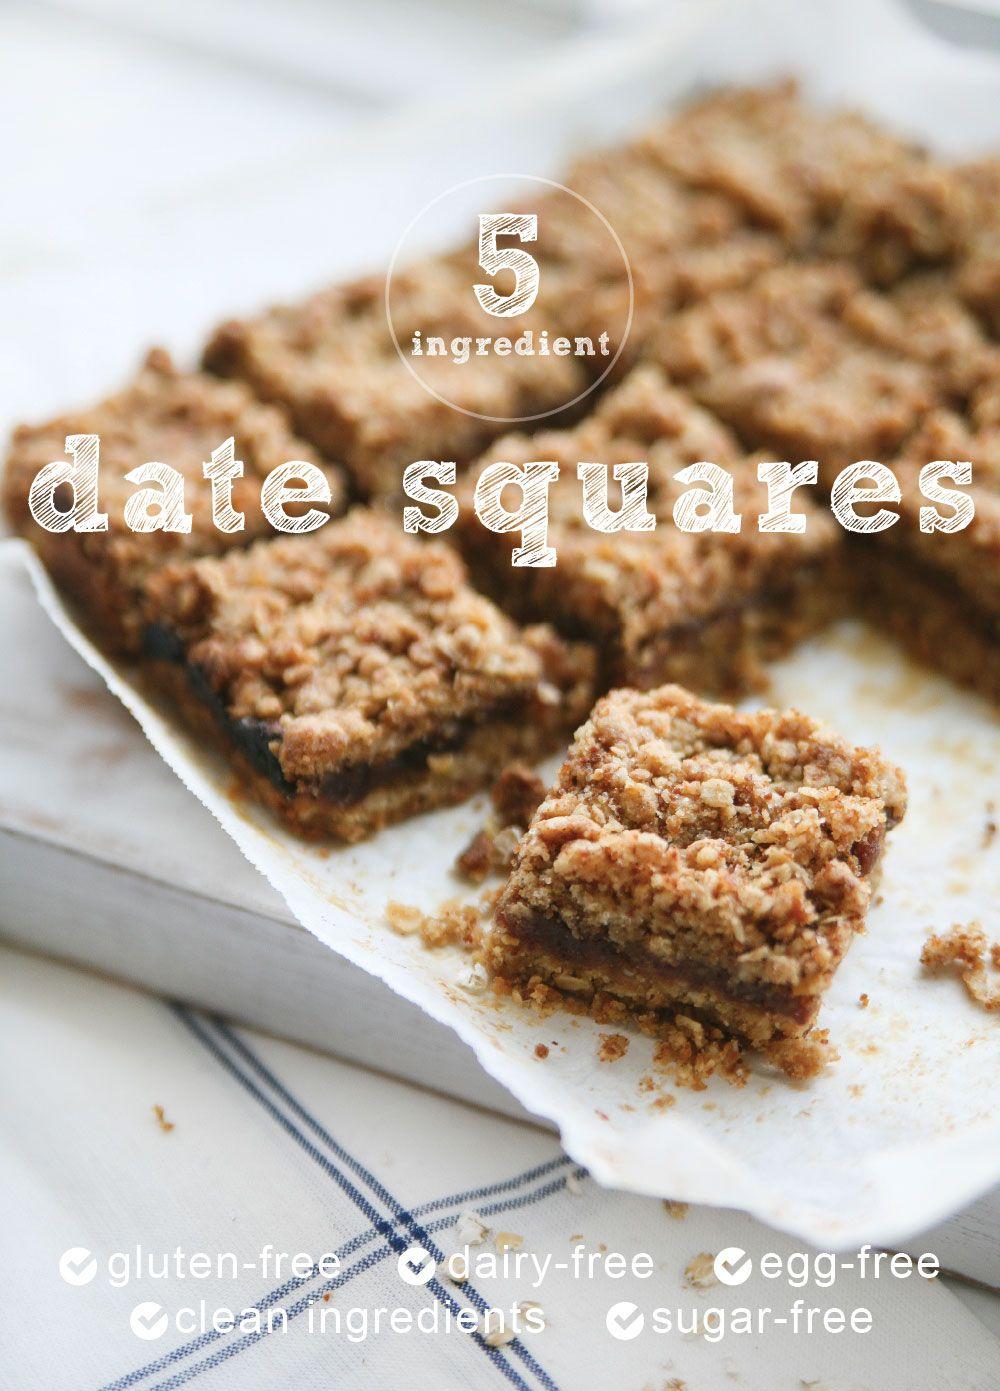 5 Ingredient Gluten-free Healthy Date Squares